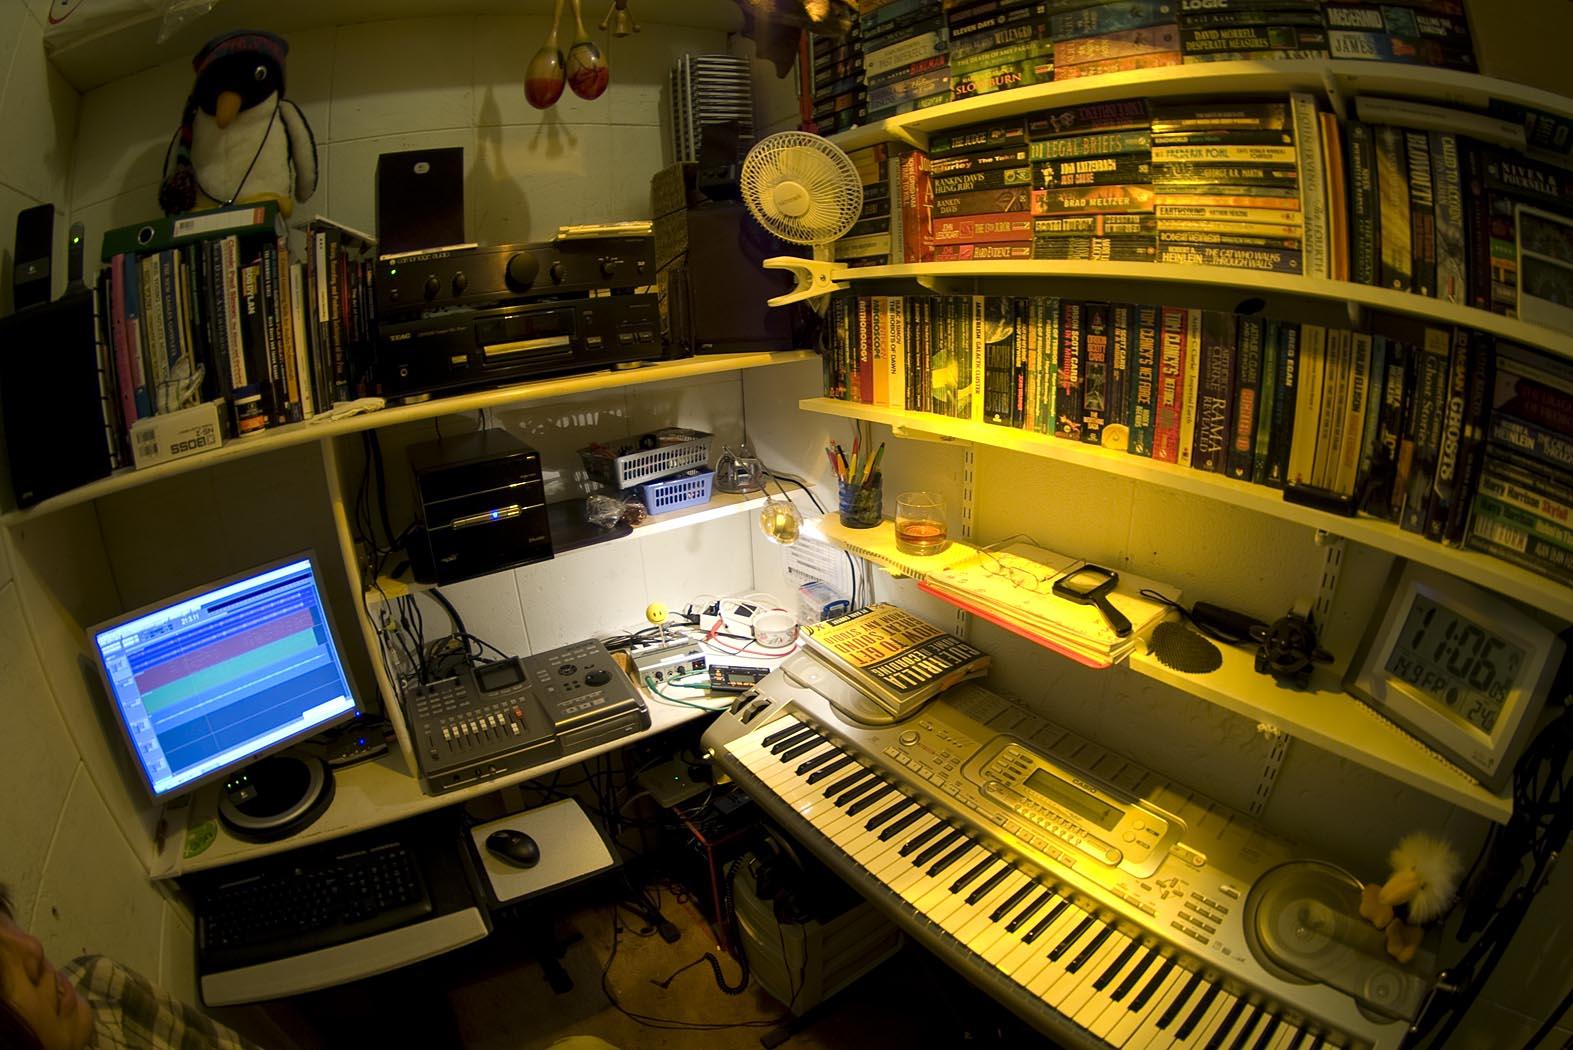 janes-studio-03-bigger-pic